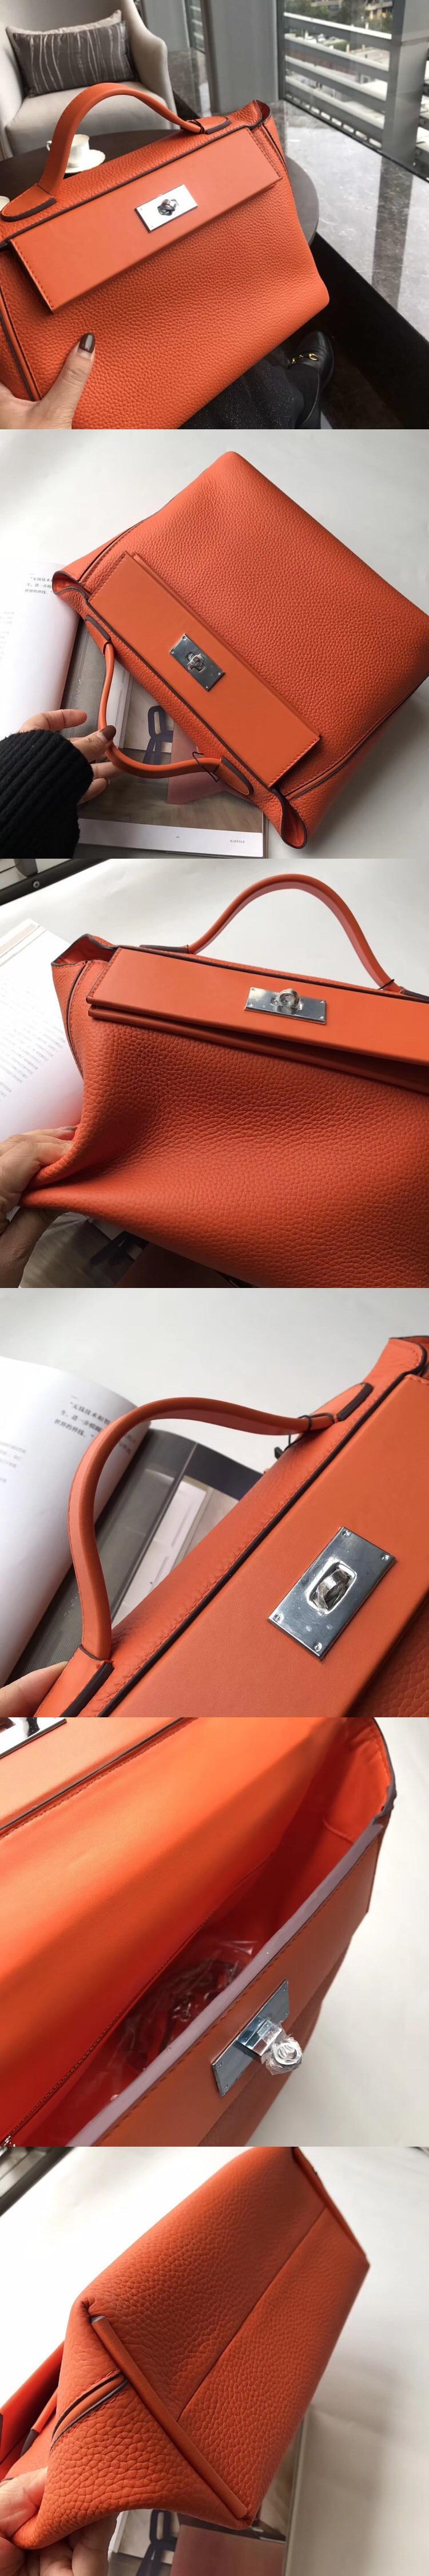 Luxury Designer Handbags 2019 Women Genuine Leather Famous Brand Handbags High Quality Tote Shoulder Bag purse (1)